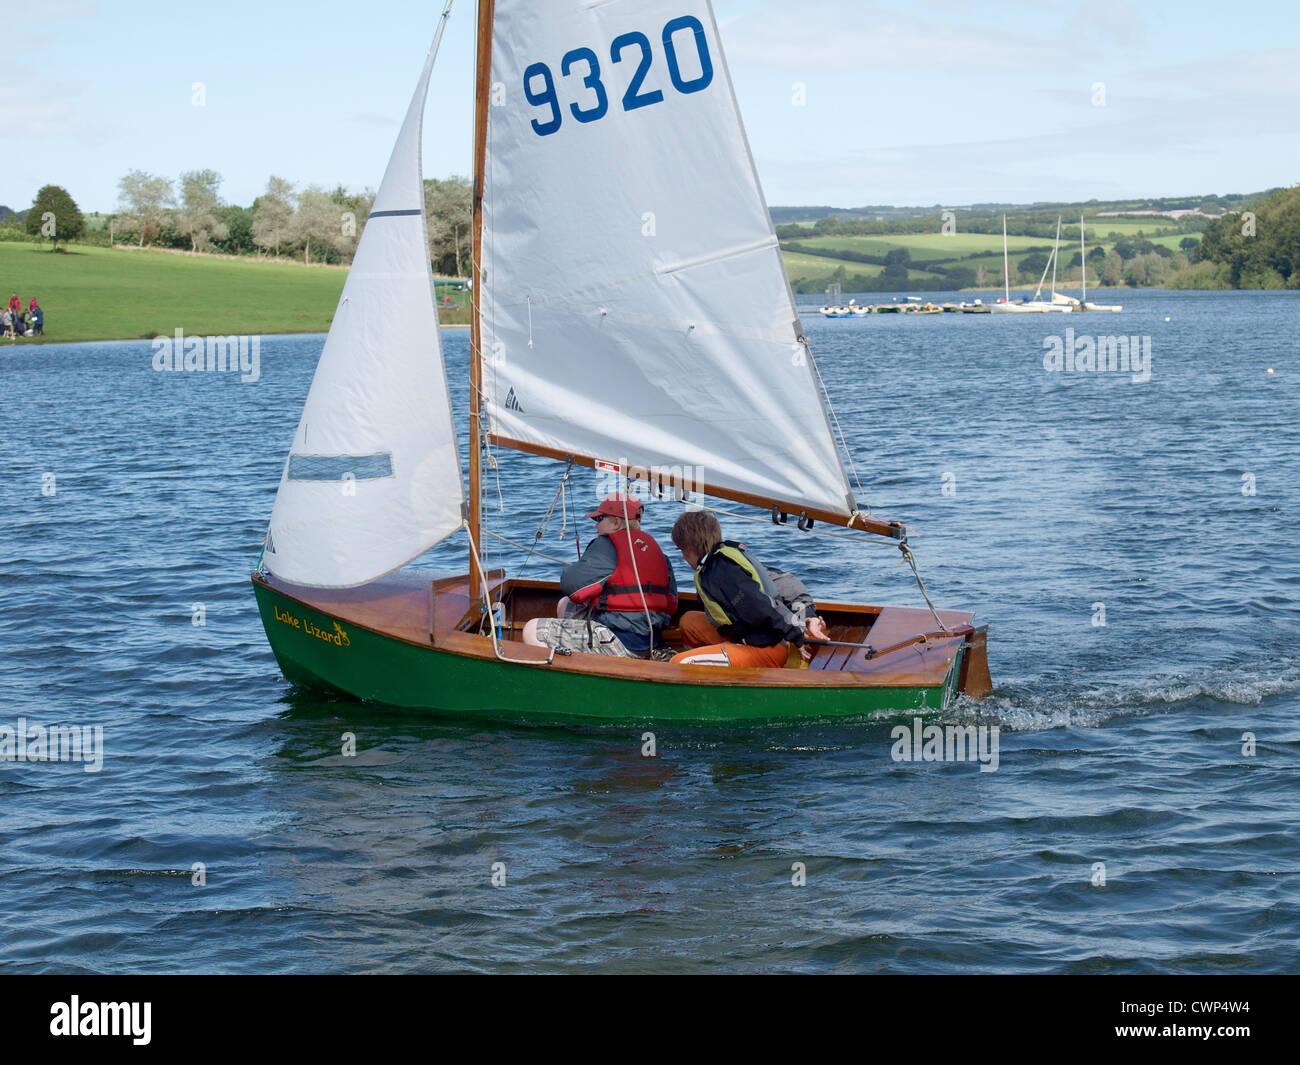 Heron sailing Dinghy  Somesret on Dinghy  Wimbleball Lake